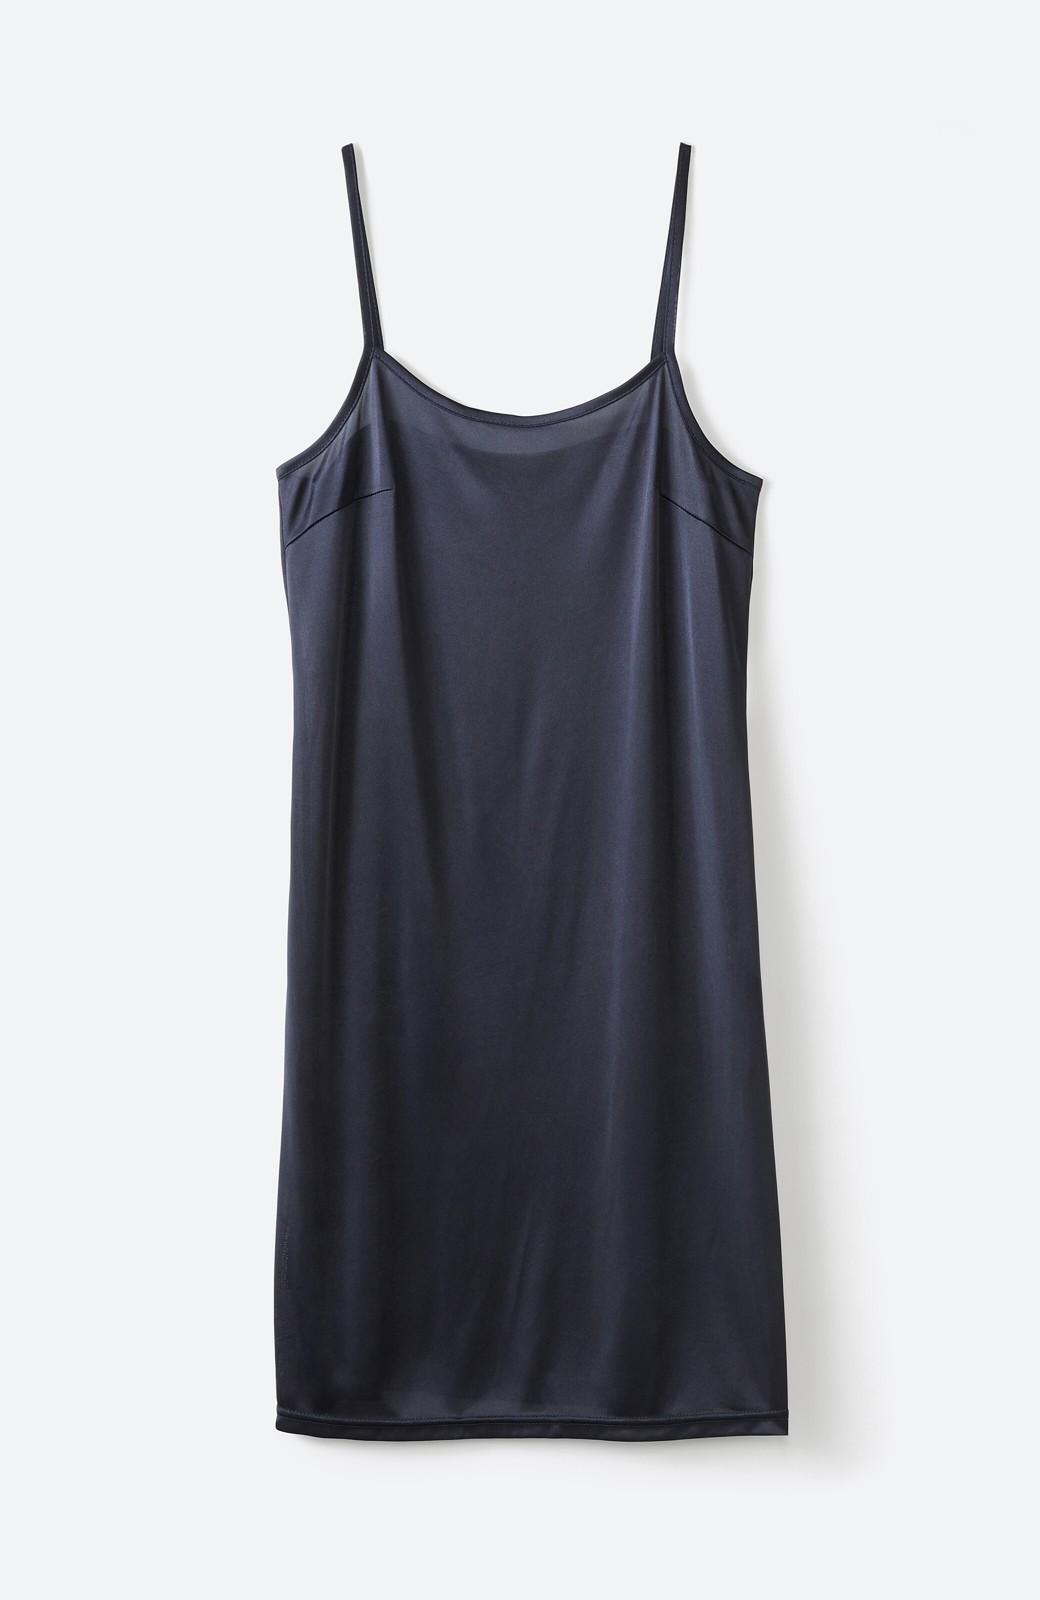 haco! 1枚でも羽織っても様になるベルト付きワンピースとインナーキャミワンピースセット <ブラック>の商品写真3